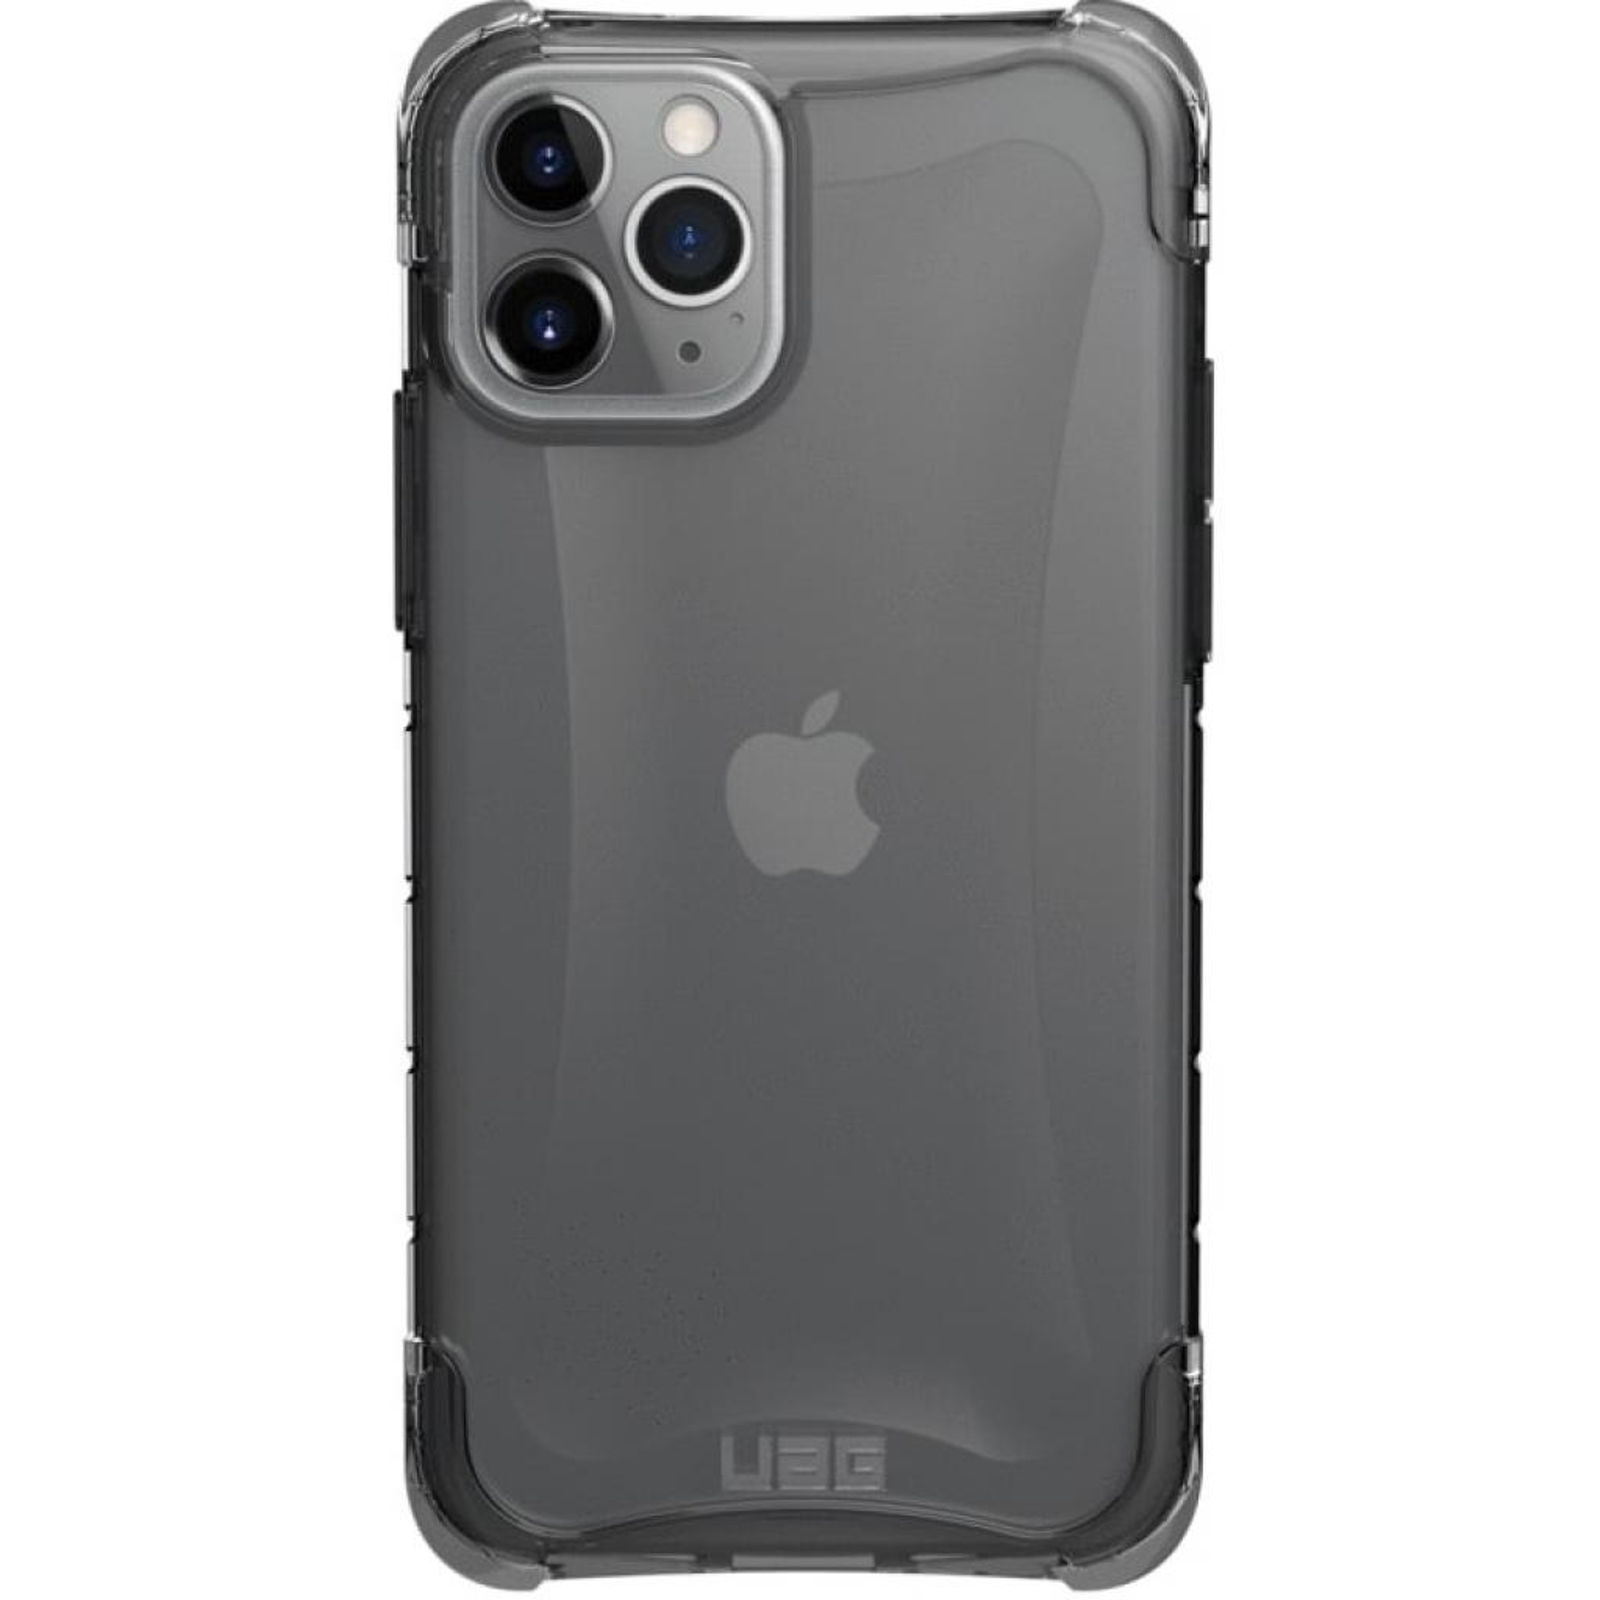 Чехол для моб. телефона Uag iPhone 11 Pro Plyo, Ash (111702113131)